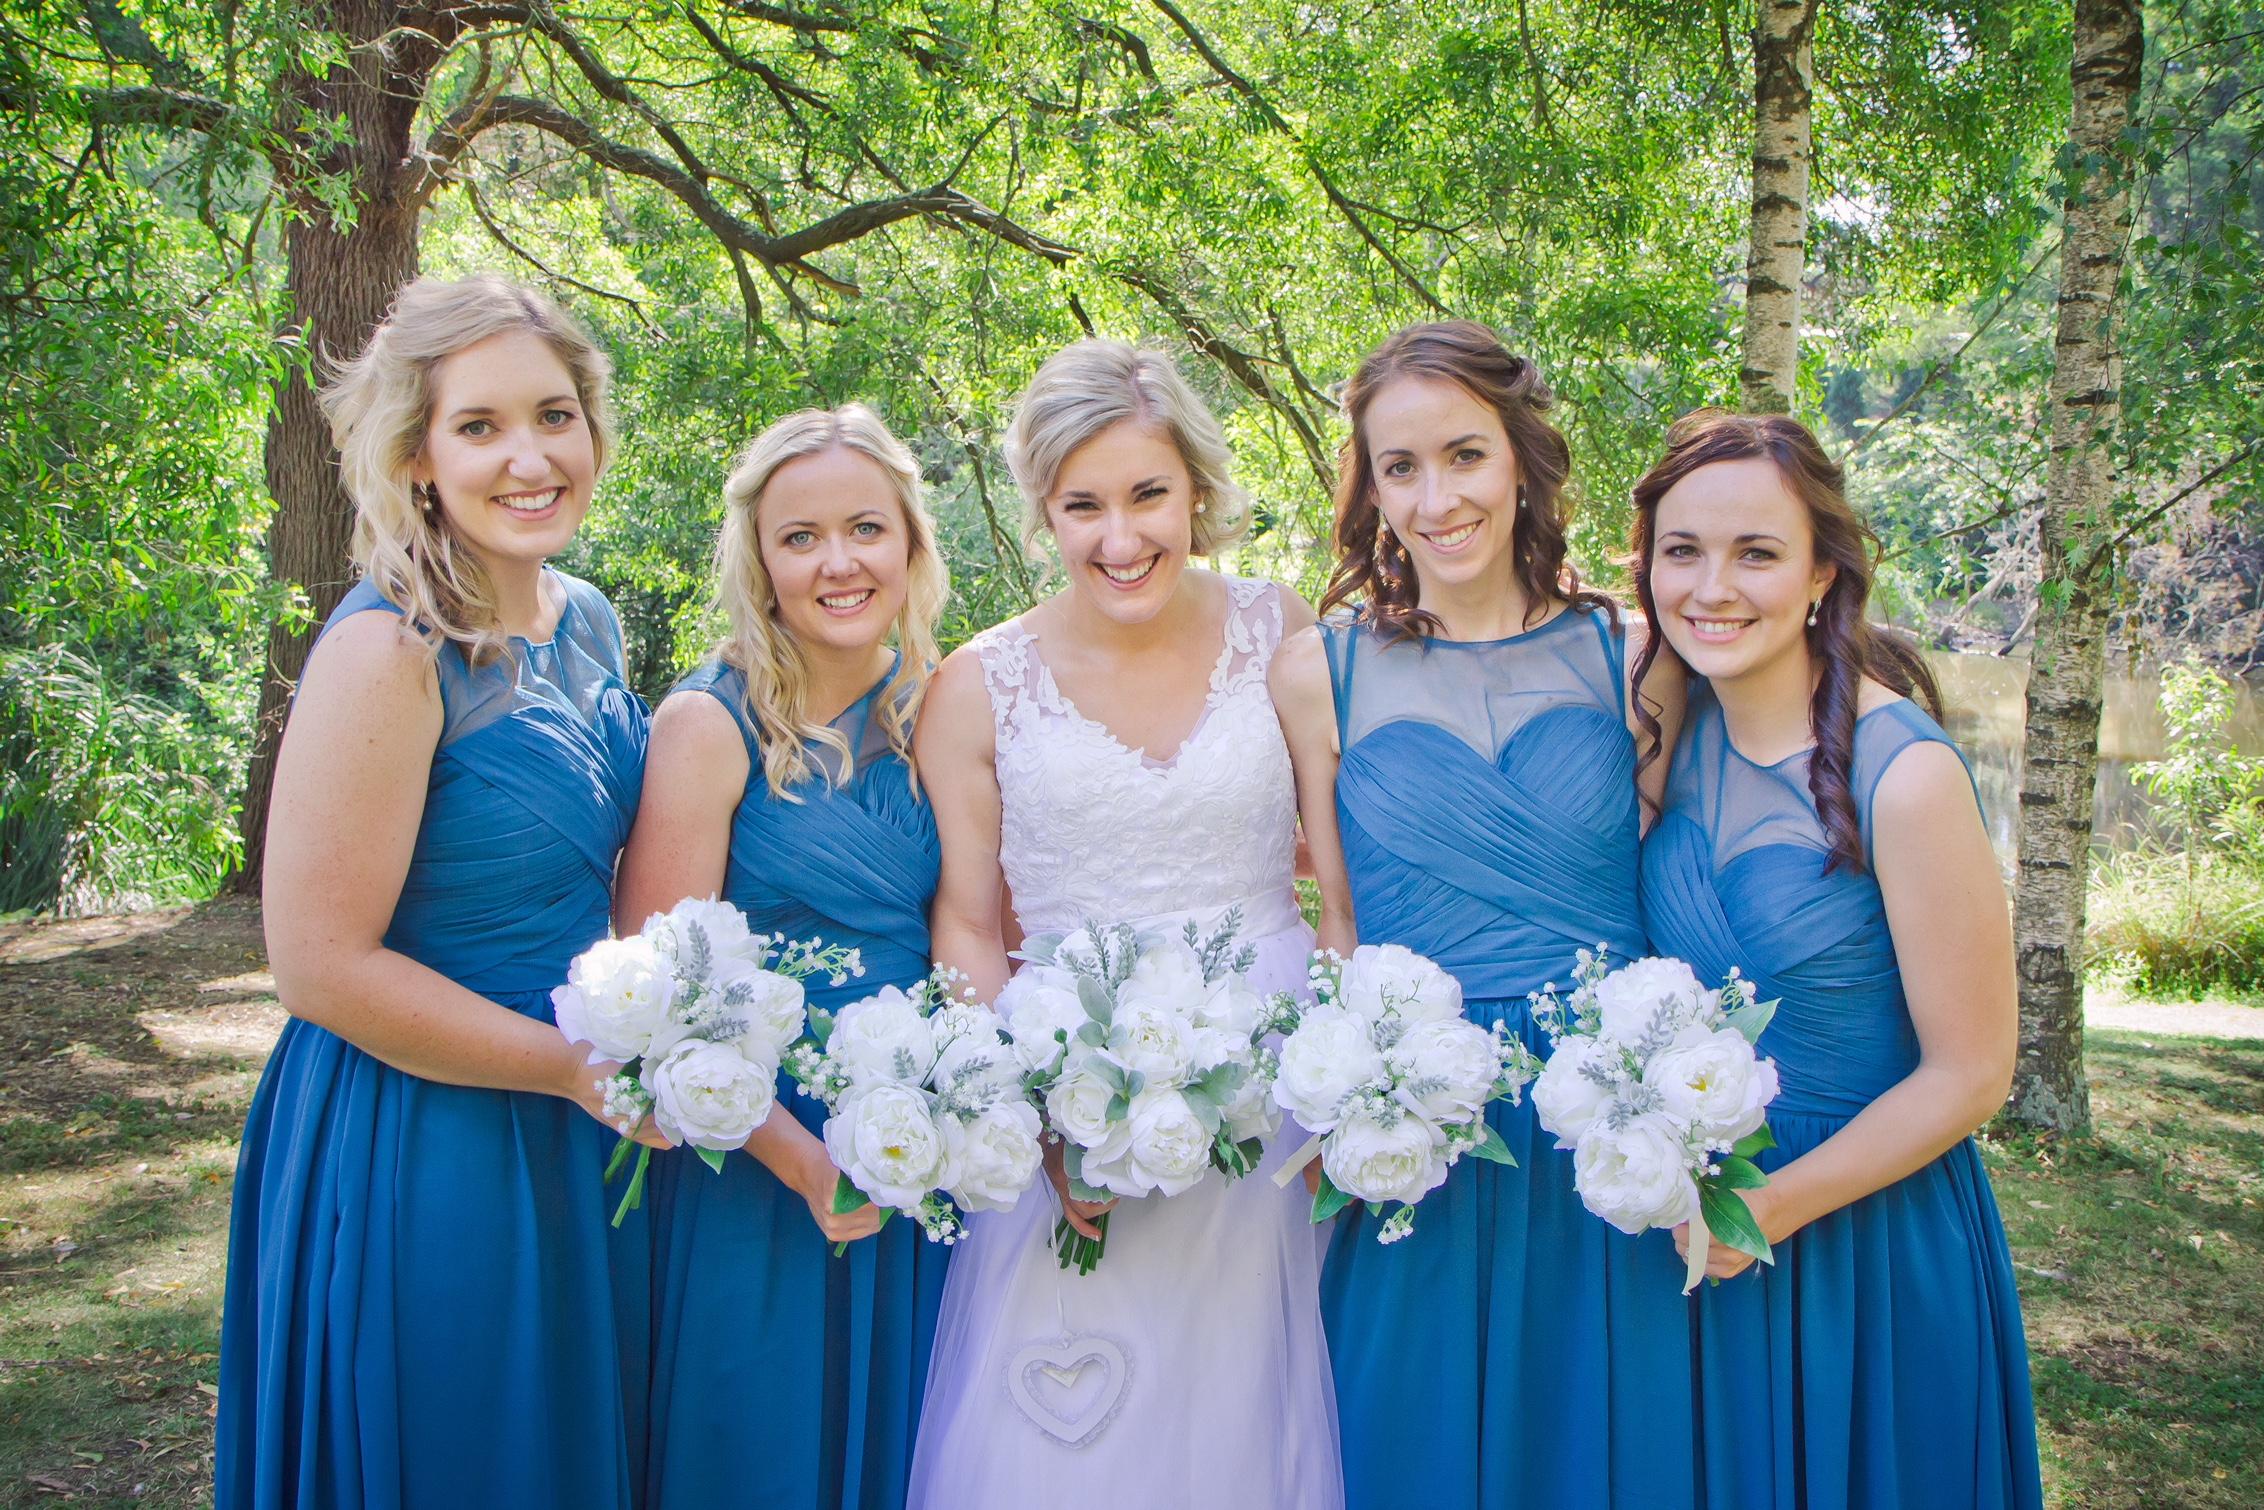 Rochelle & Bridesmaids